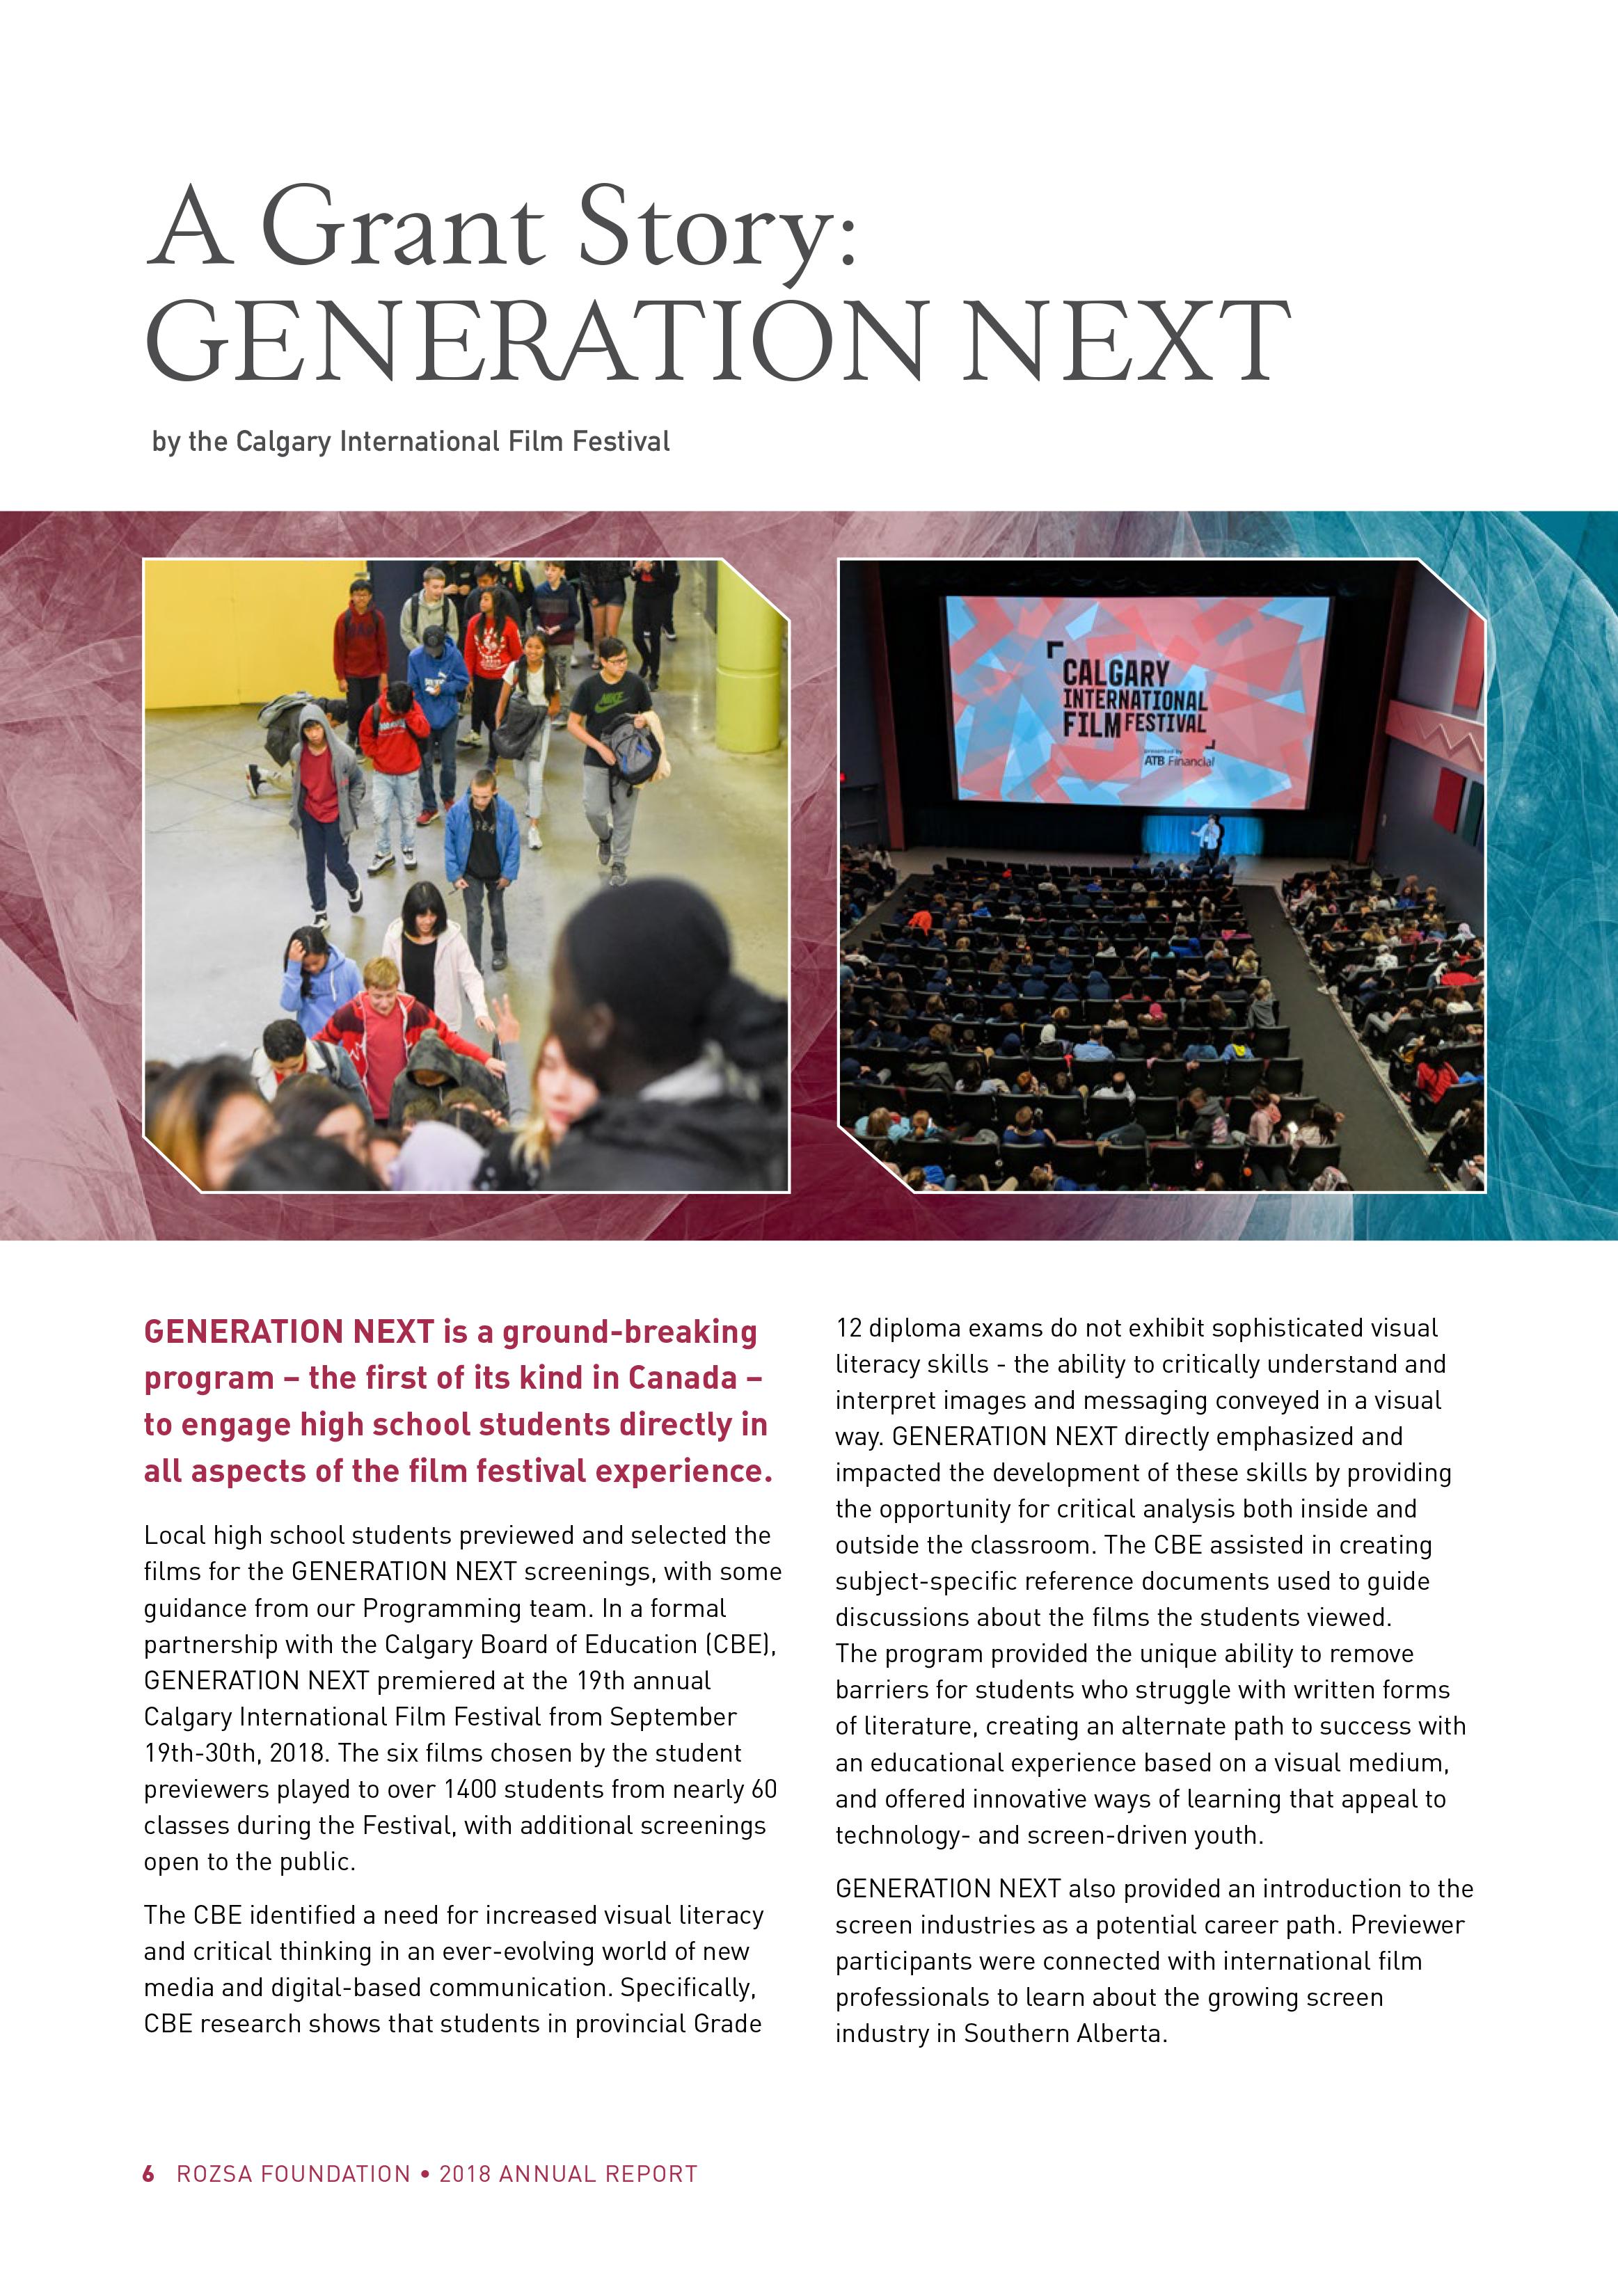 2018 Rozsa Foundation Annual Report-8